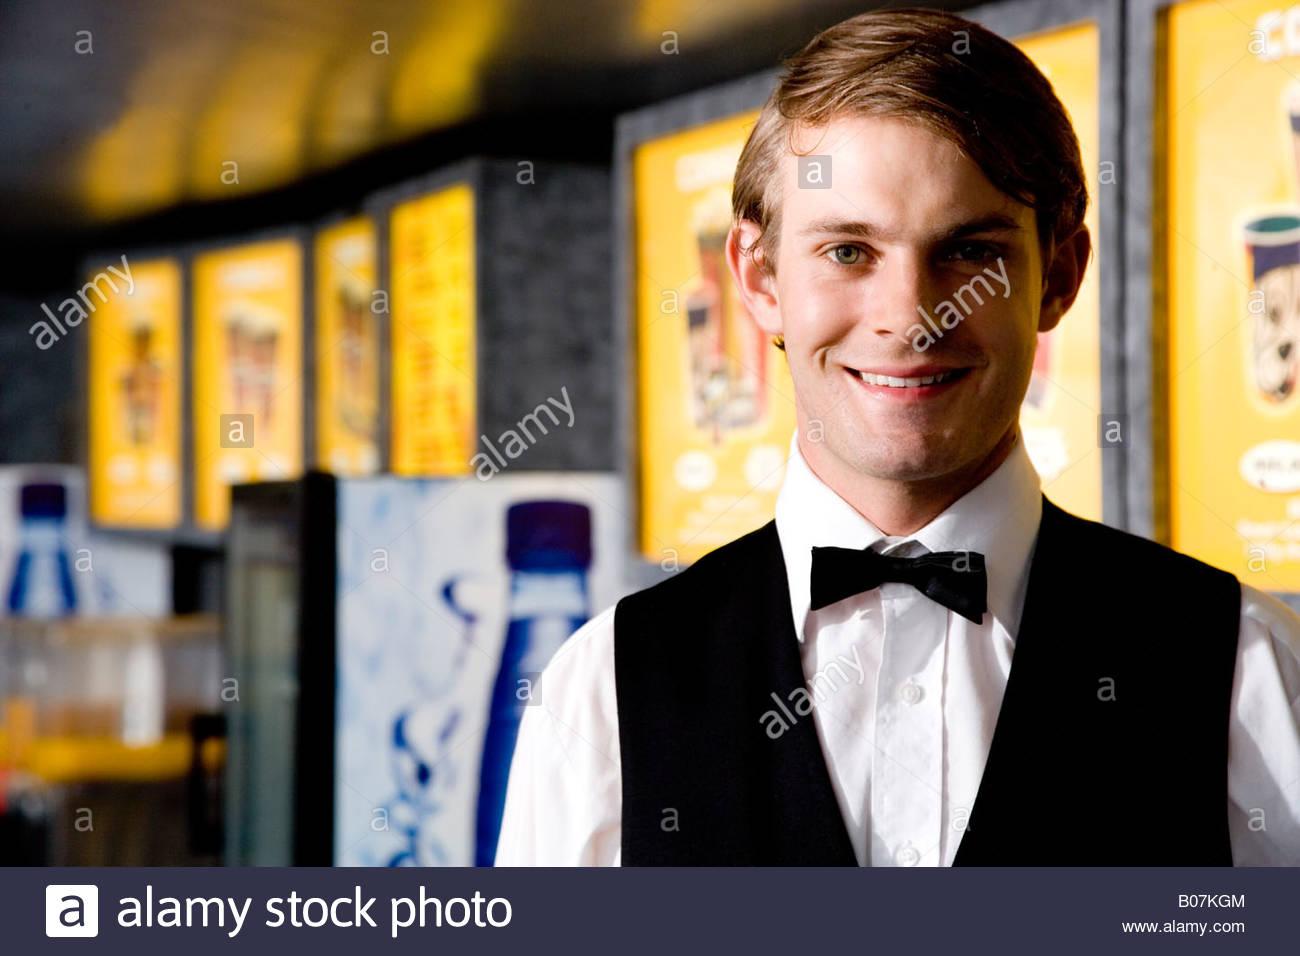 Smartly dressed usher at the cinema smiling - Stock Image